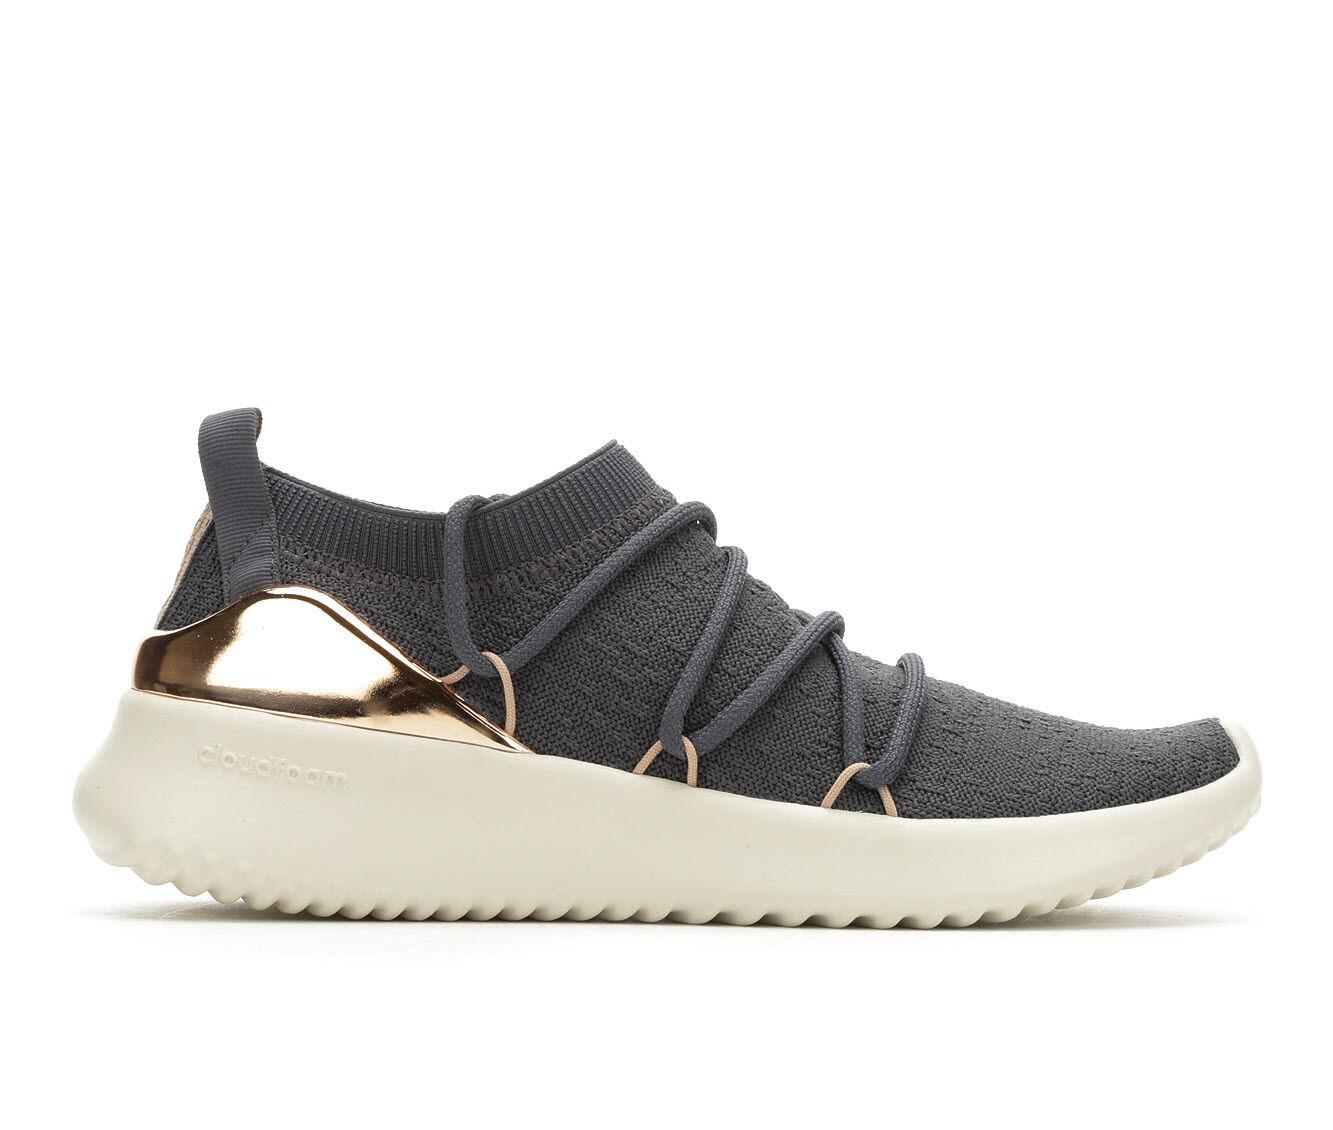 Women's Adidas Ultimamotion Slip-On Sneakers Gry/Met/Nude